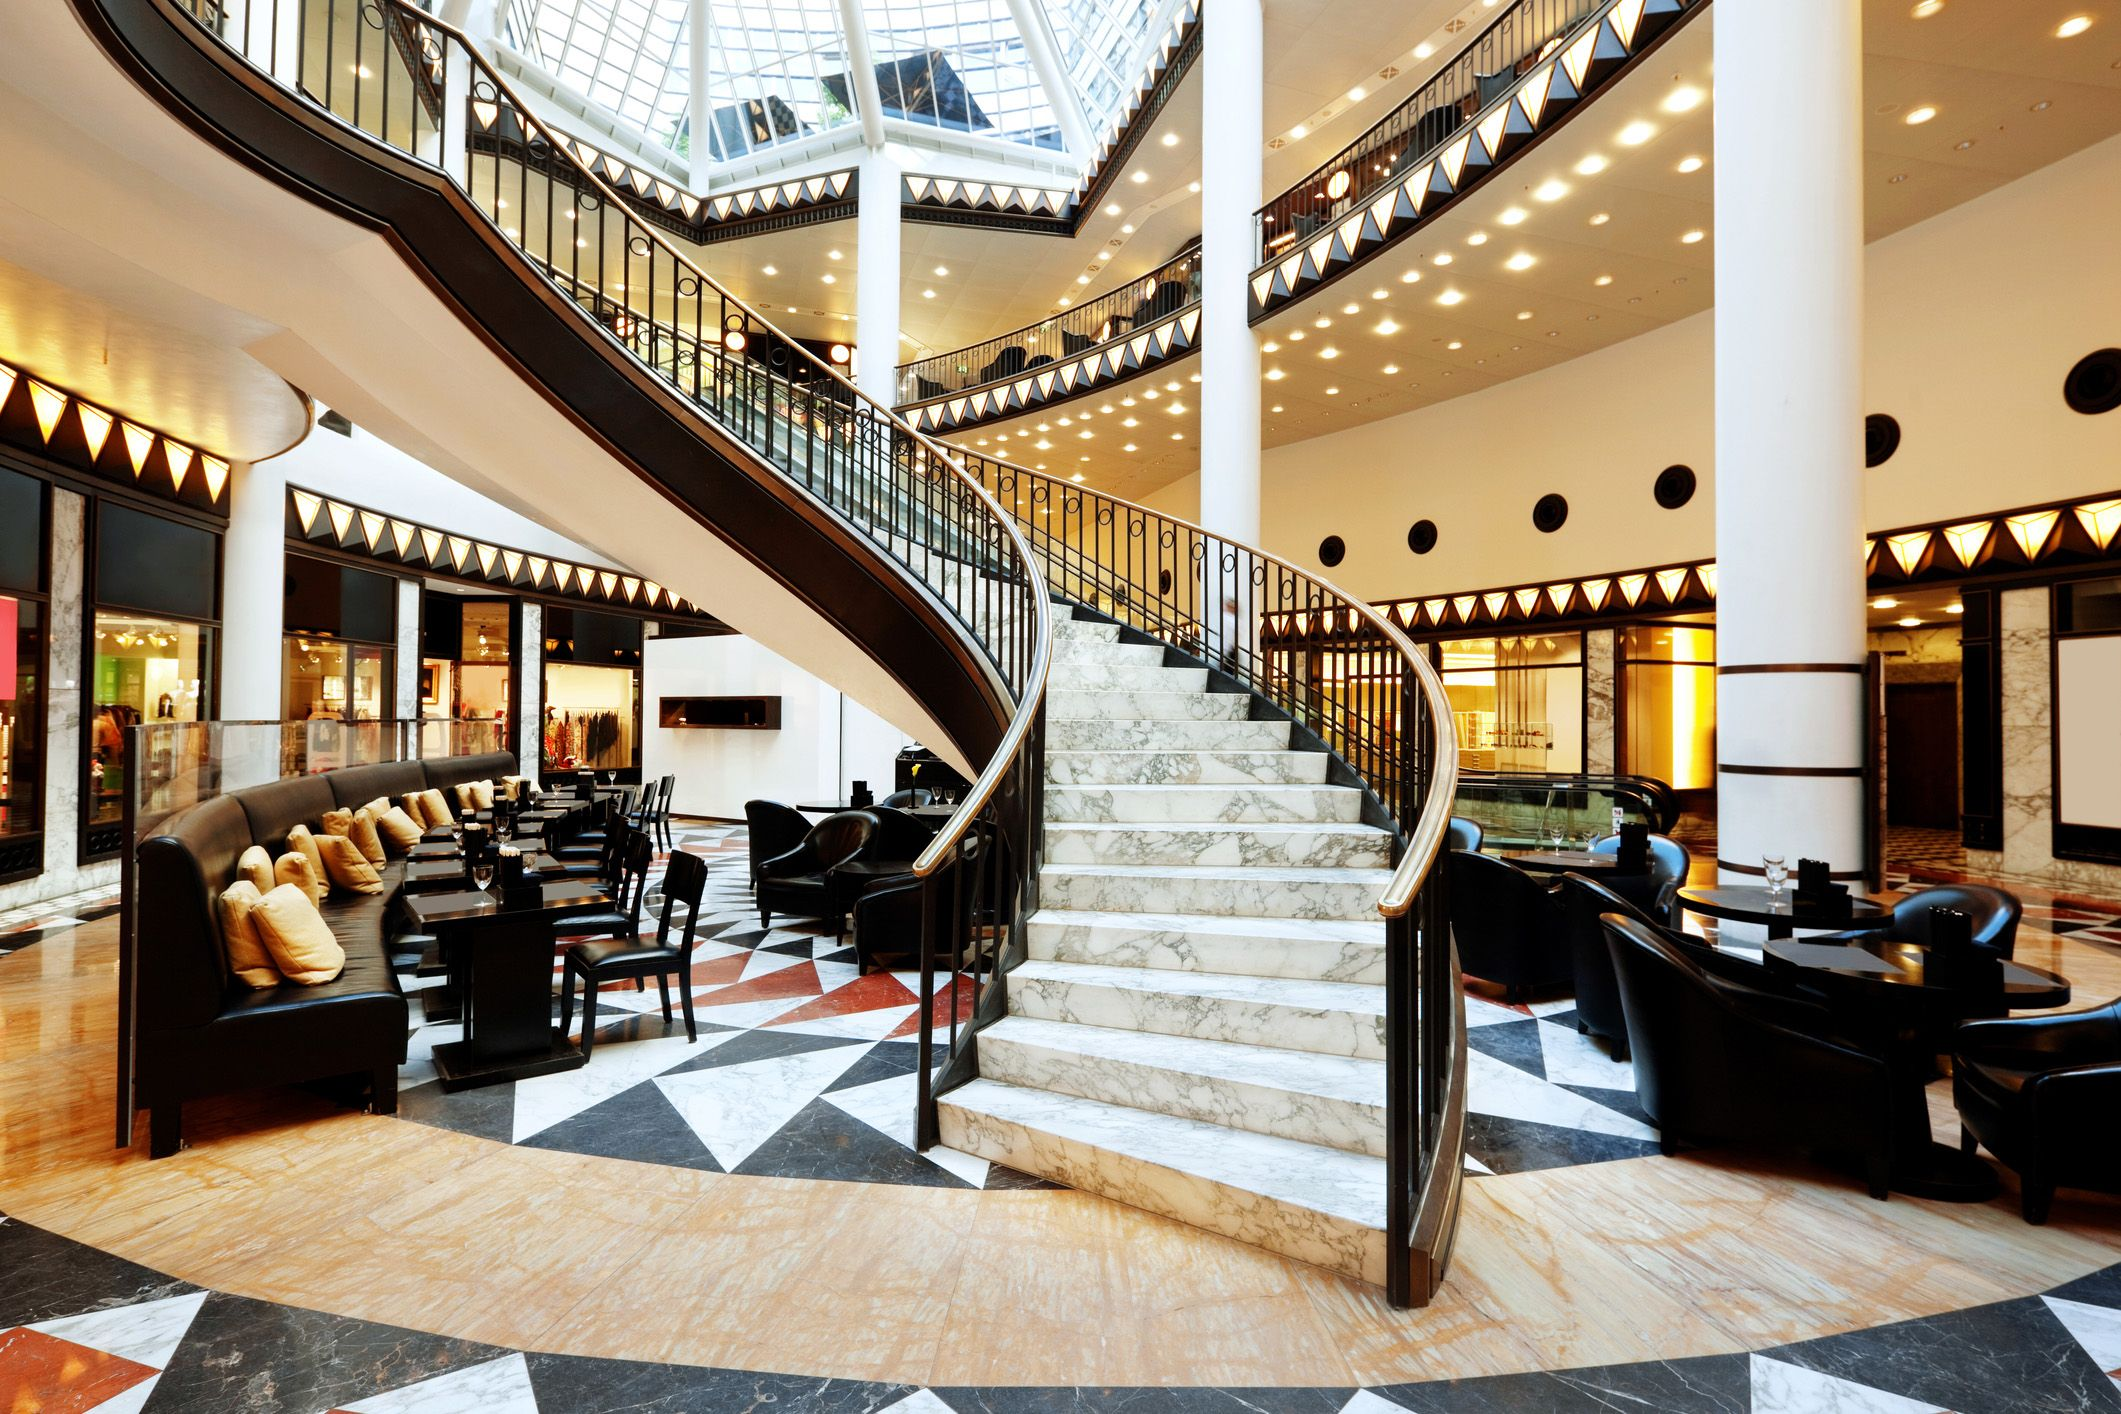 10 Beautiful Hotel Lobbies Across America Luxury Staircase Beautiful Hotels Lobby Hotel Lobby